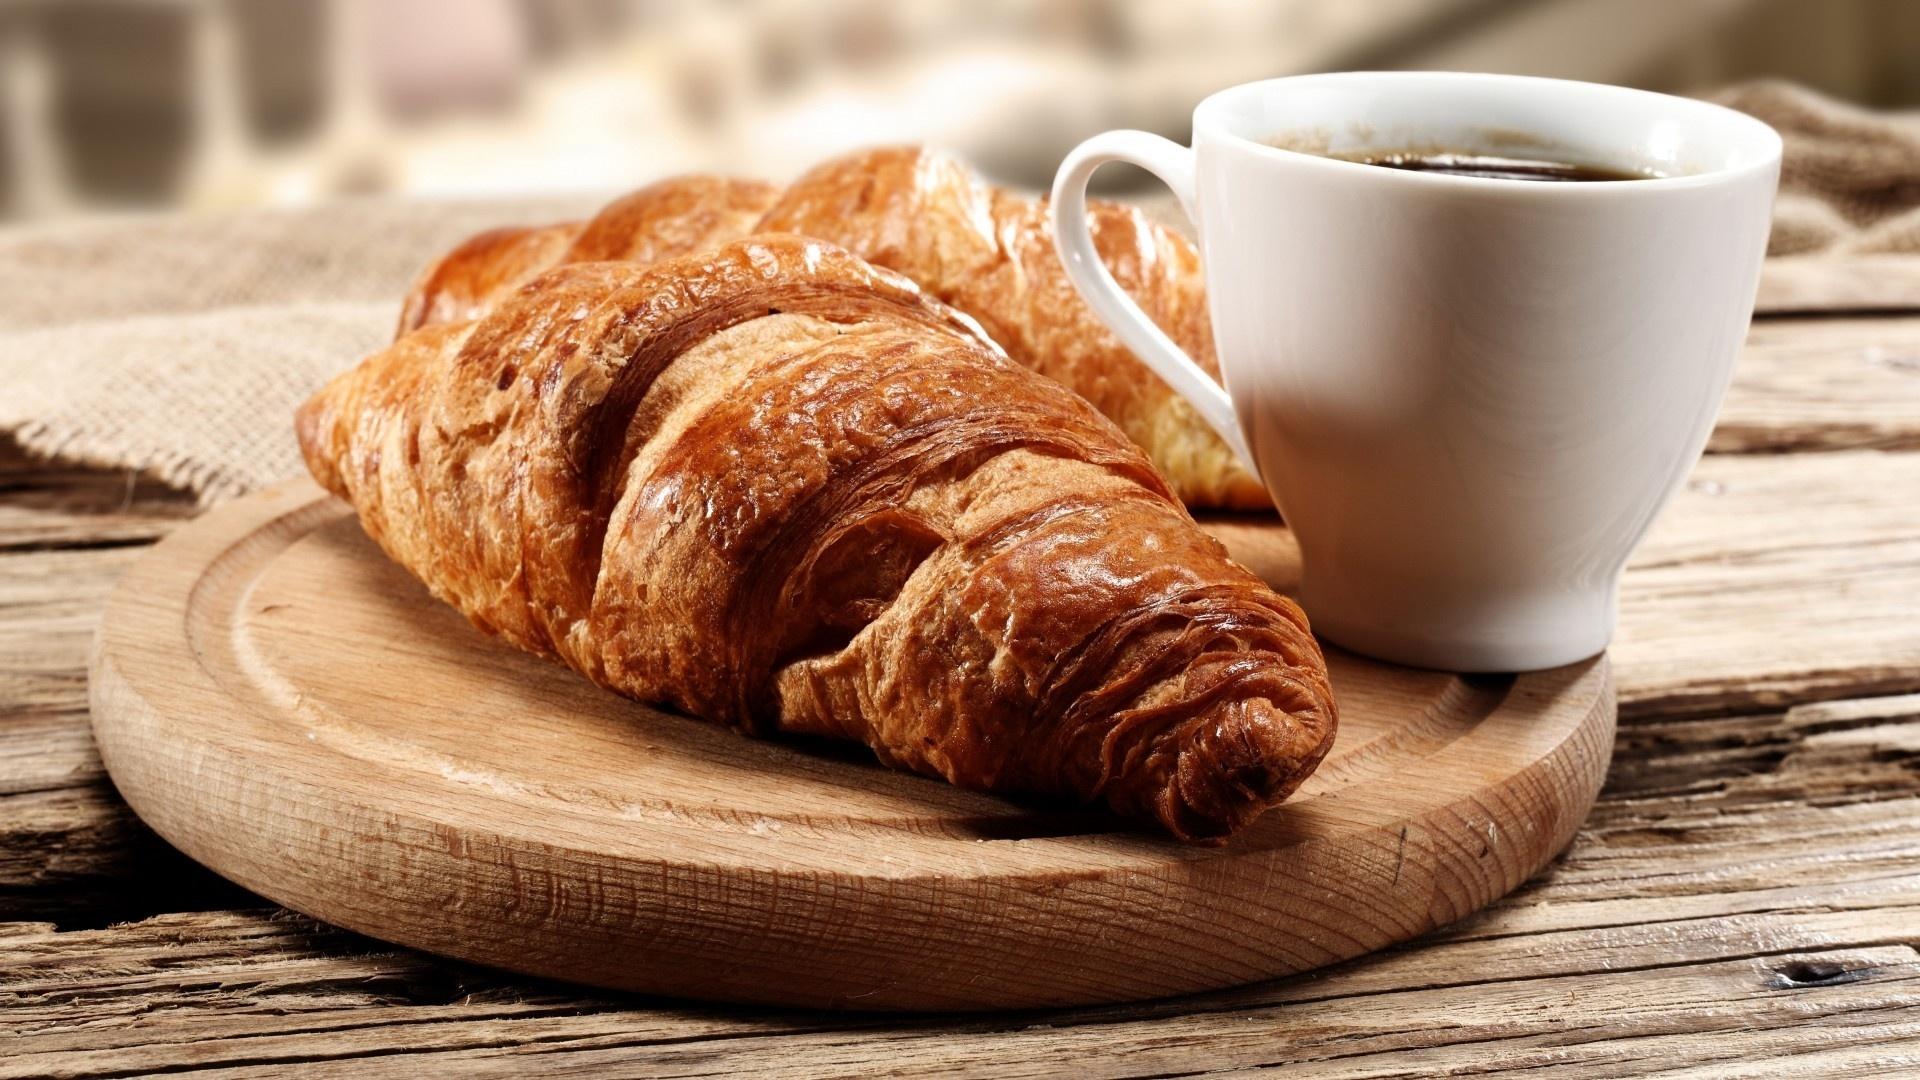 Croissants desktop wallpaper hd